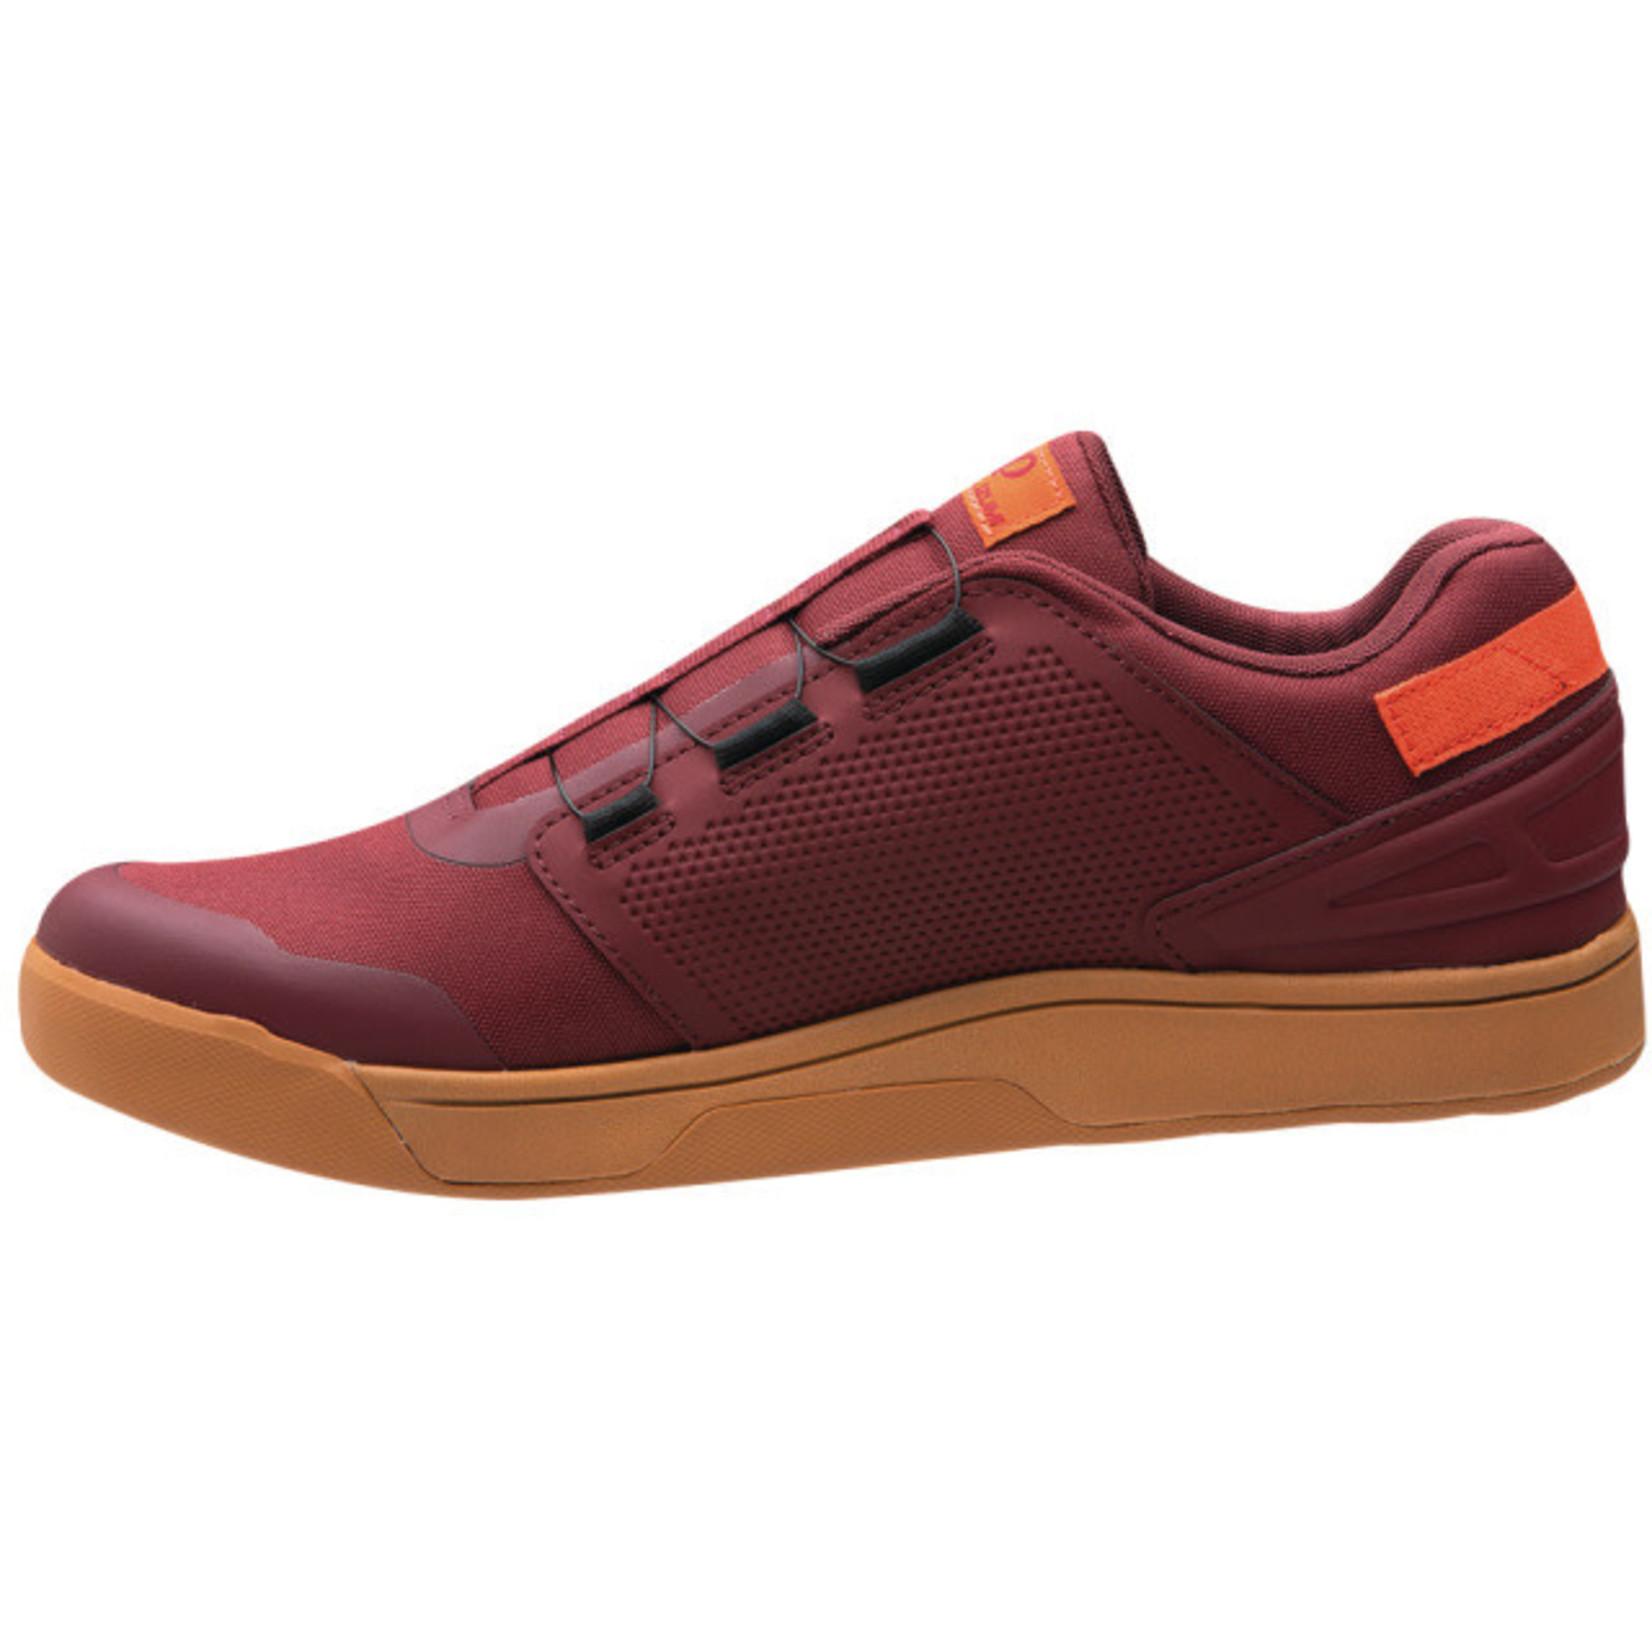 Pearl iZUMi PEARL iZUMi - scarpe X-Alp Launch - Redwood Sunset Orange